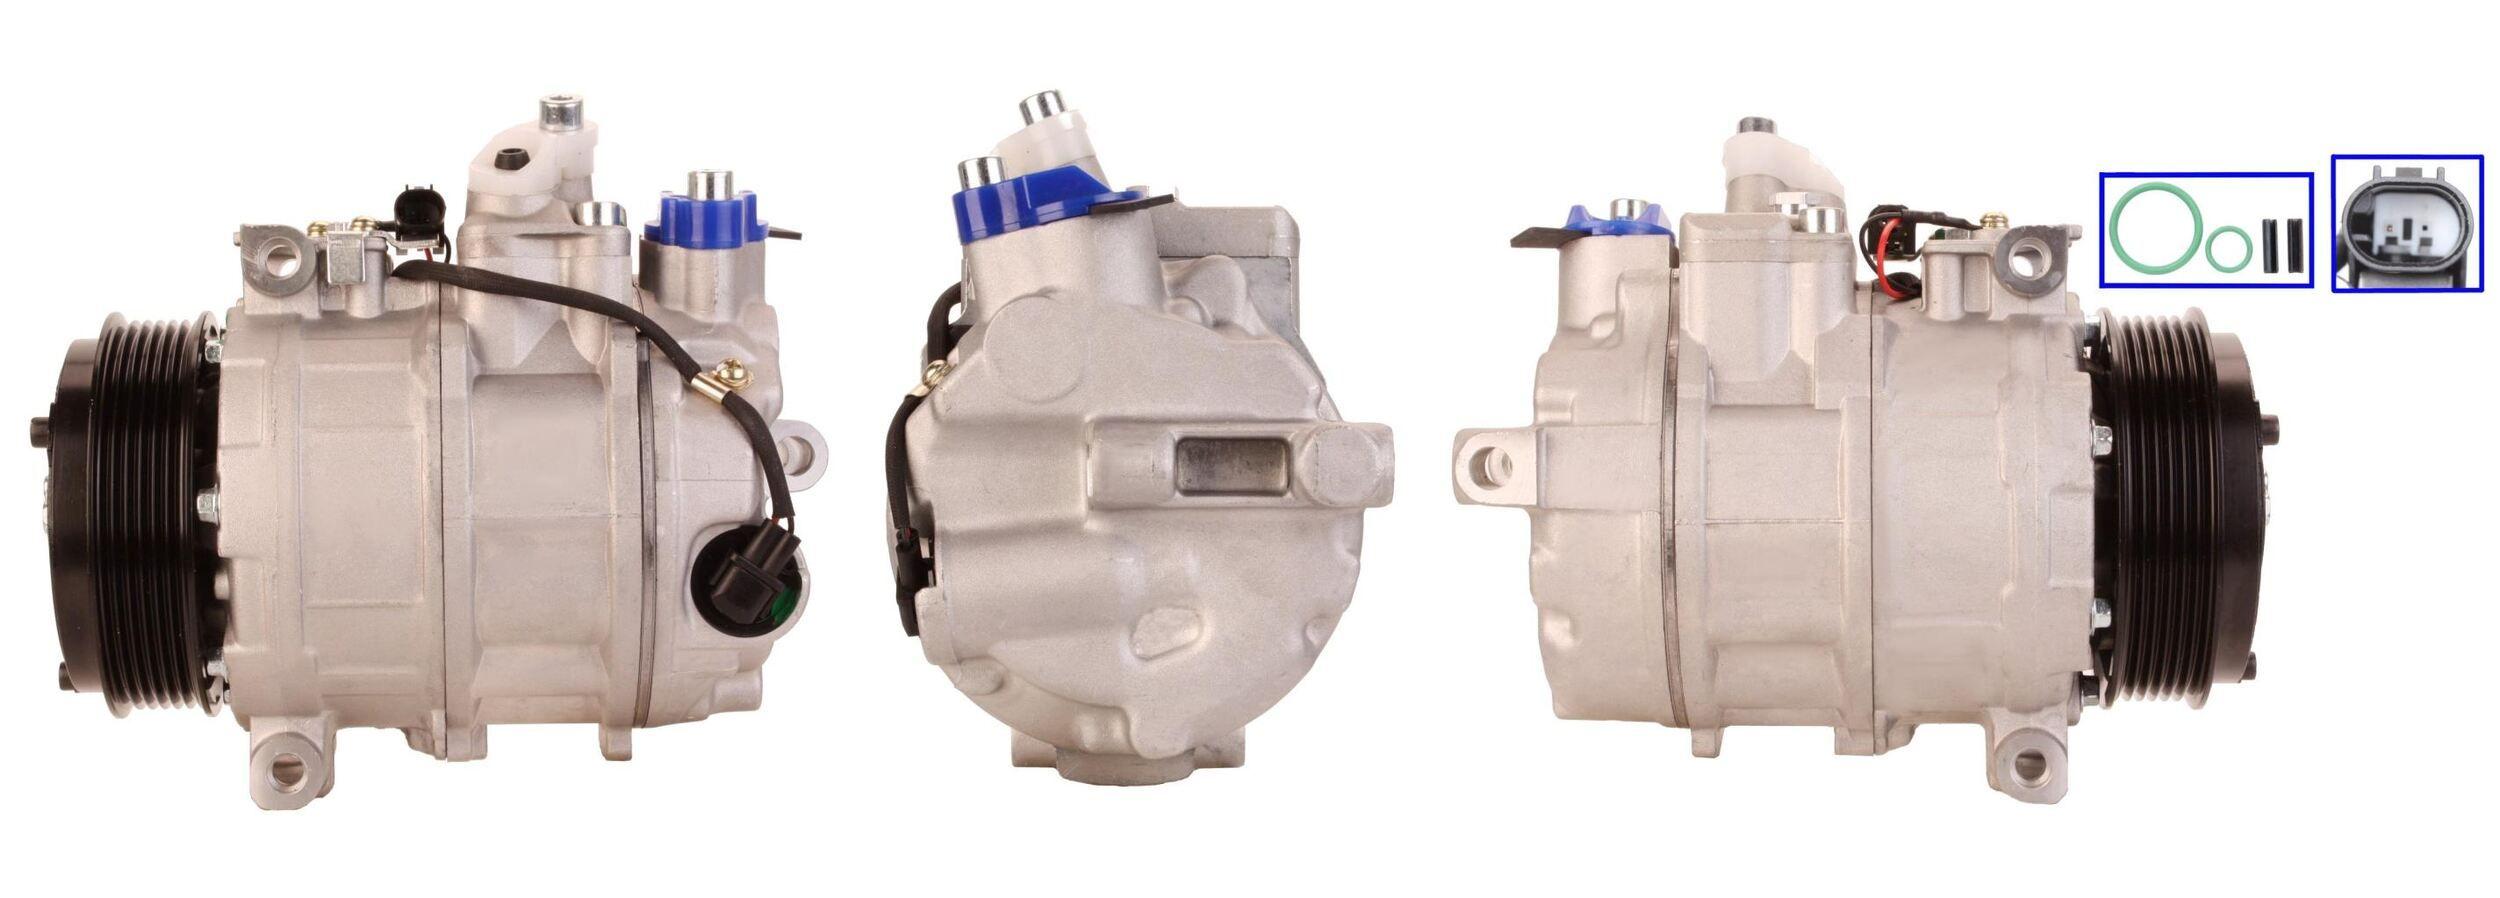 Klimakompressor ELSTOCK 51-0256